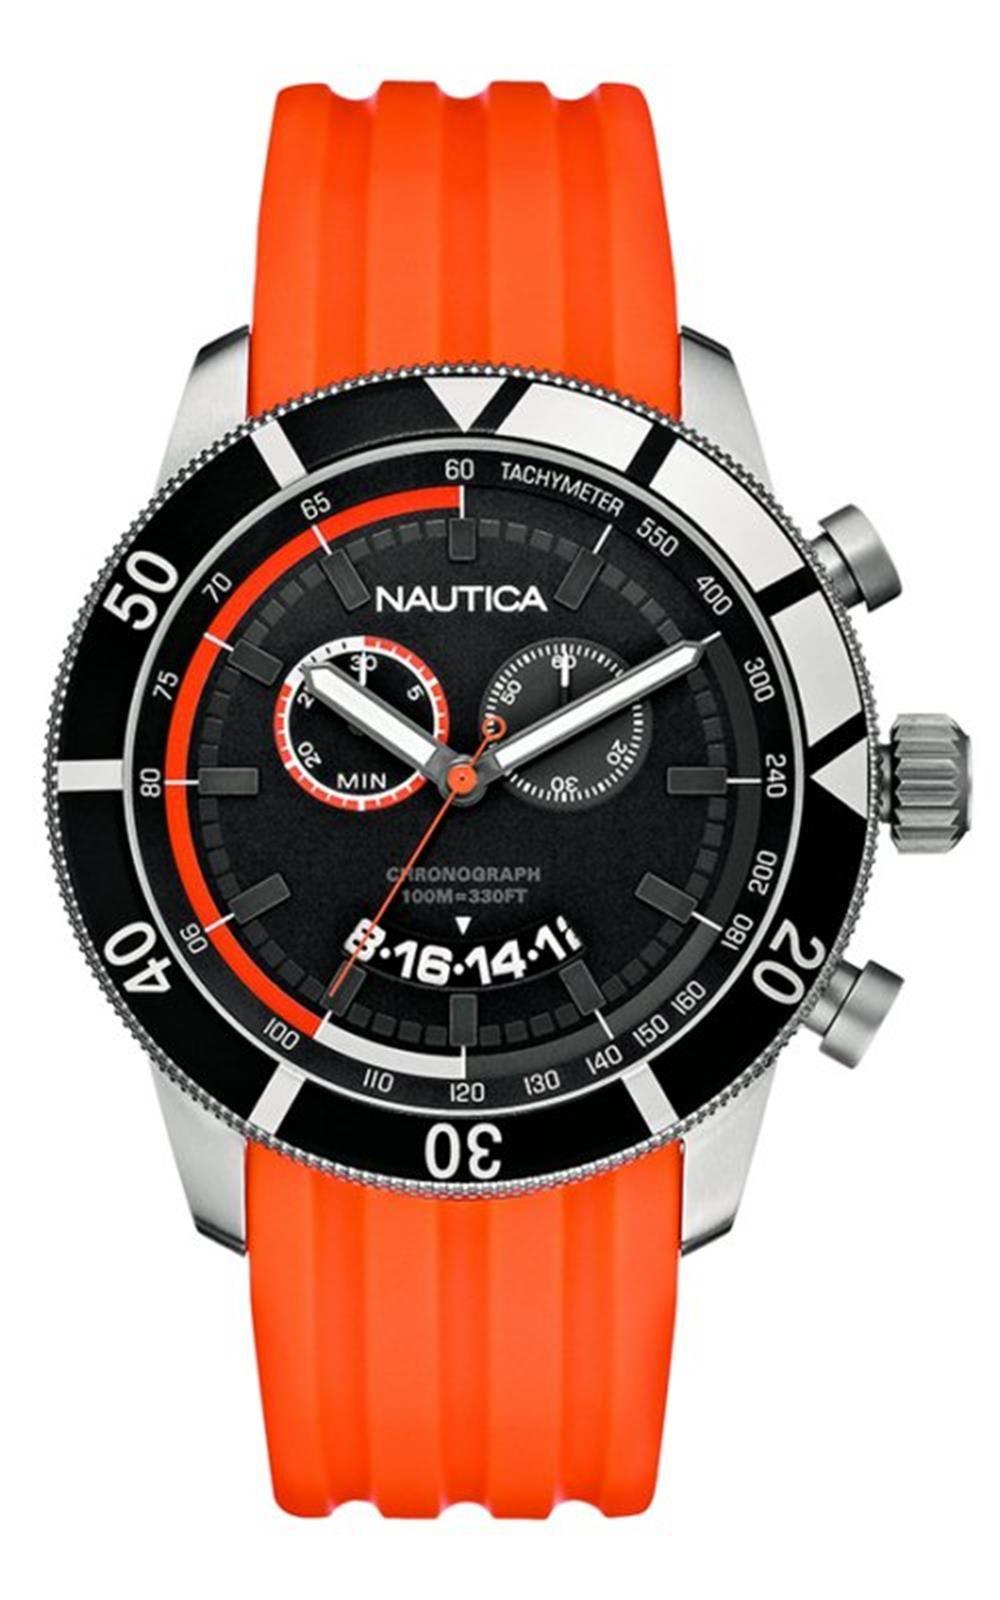 Nautica Kol Saati Spor Saatleri Luks Saatler Saatler